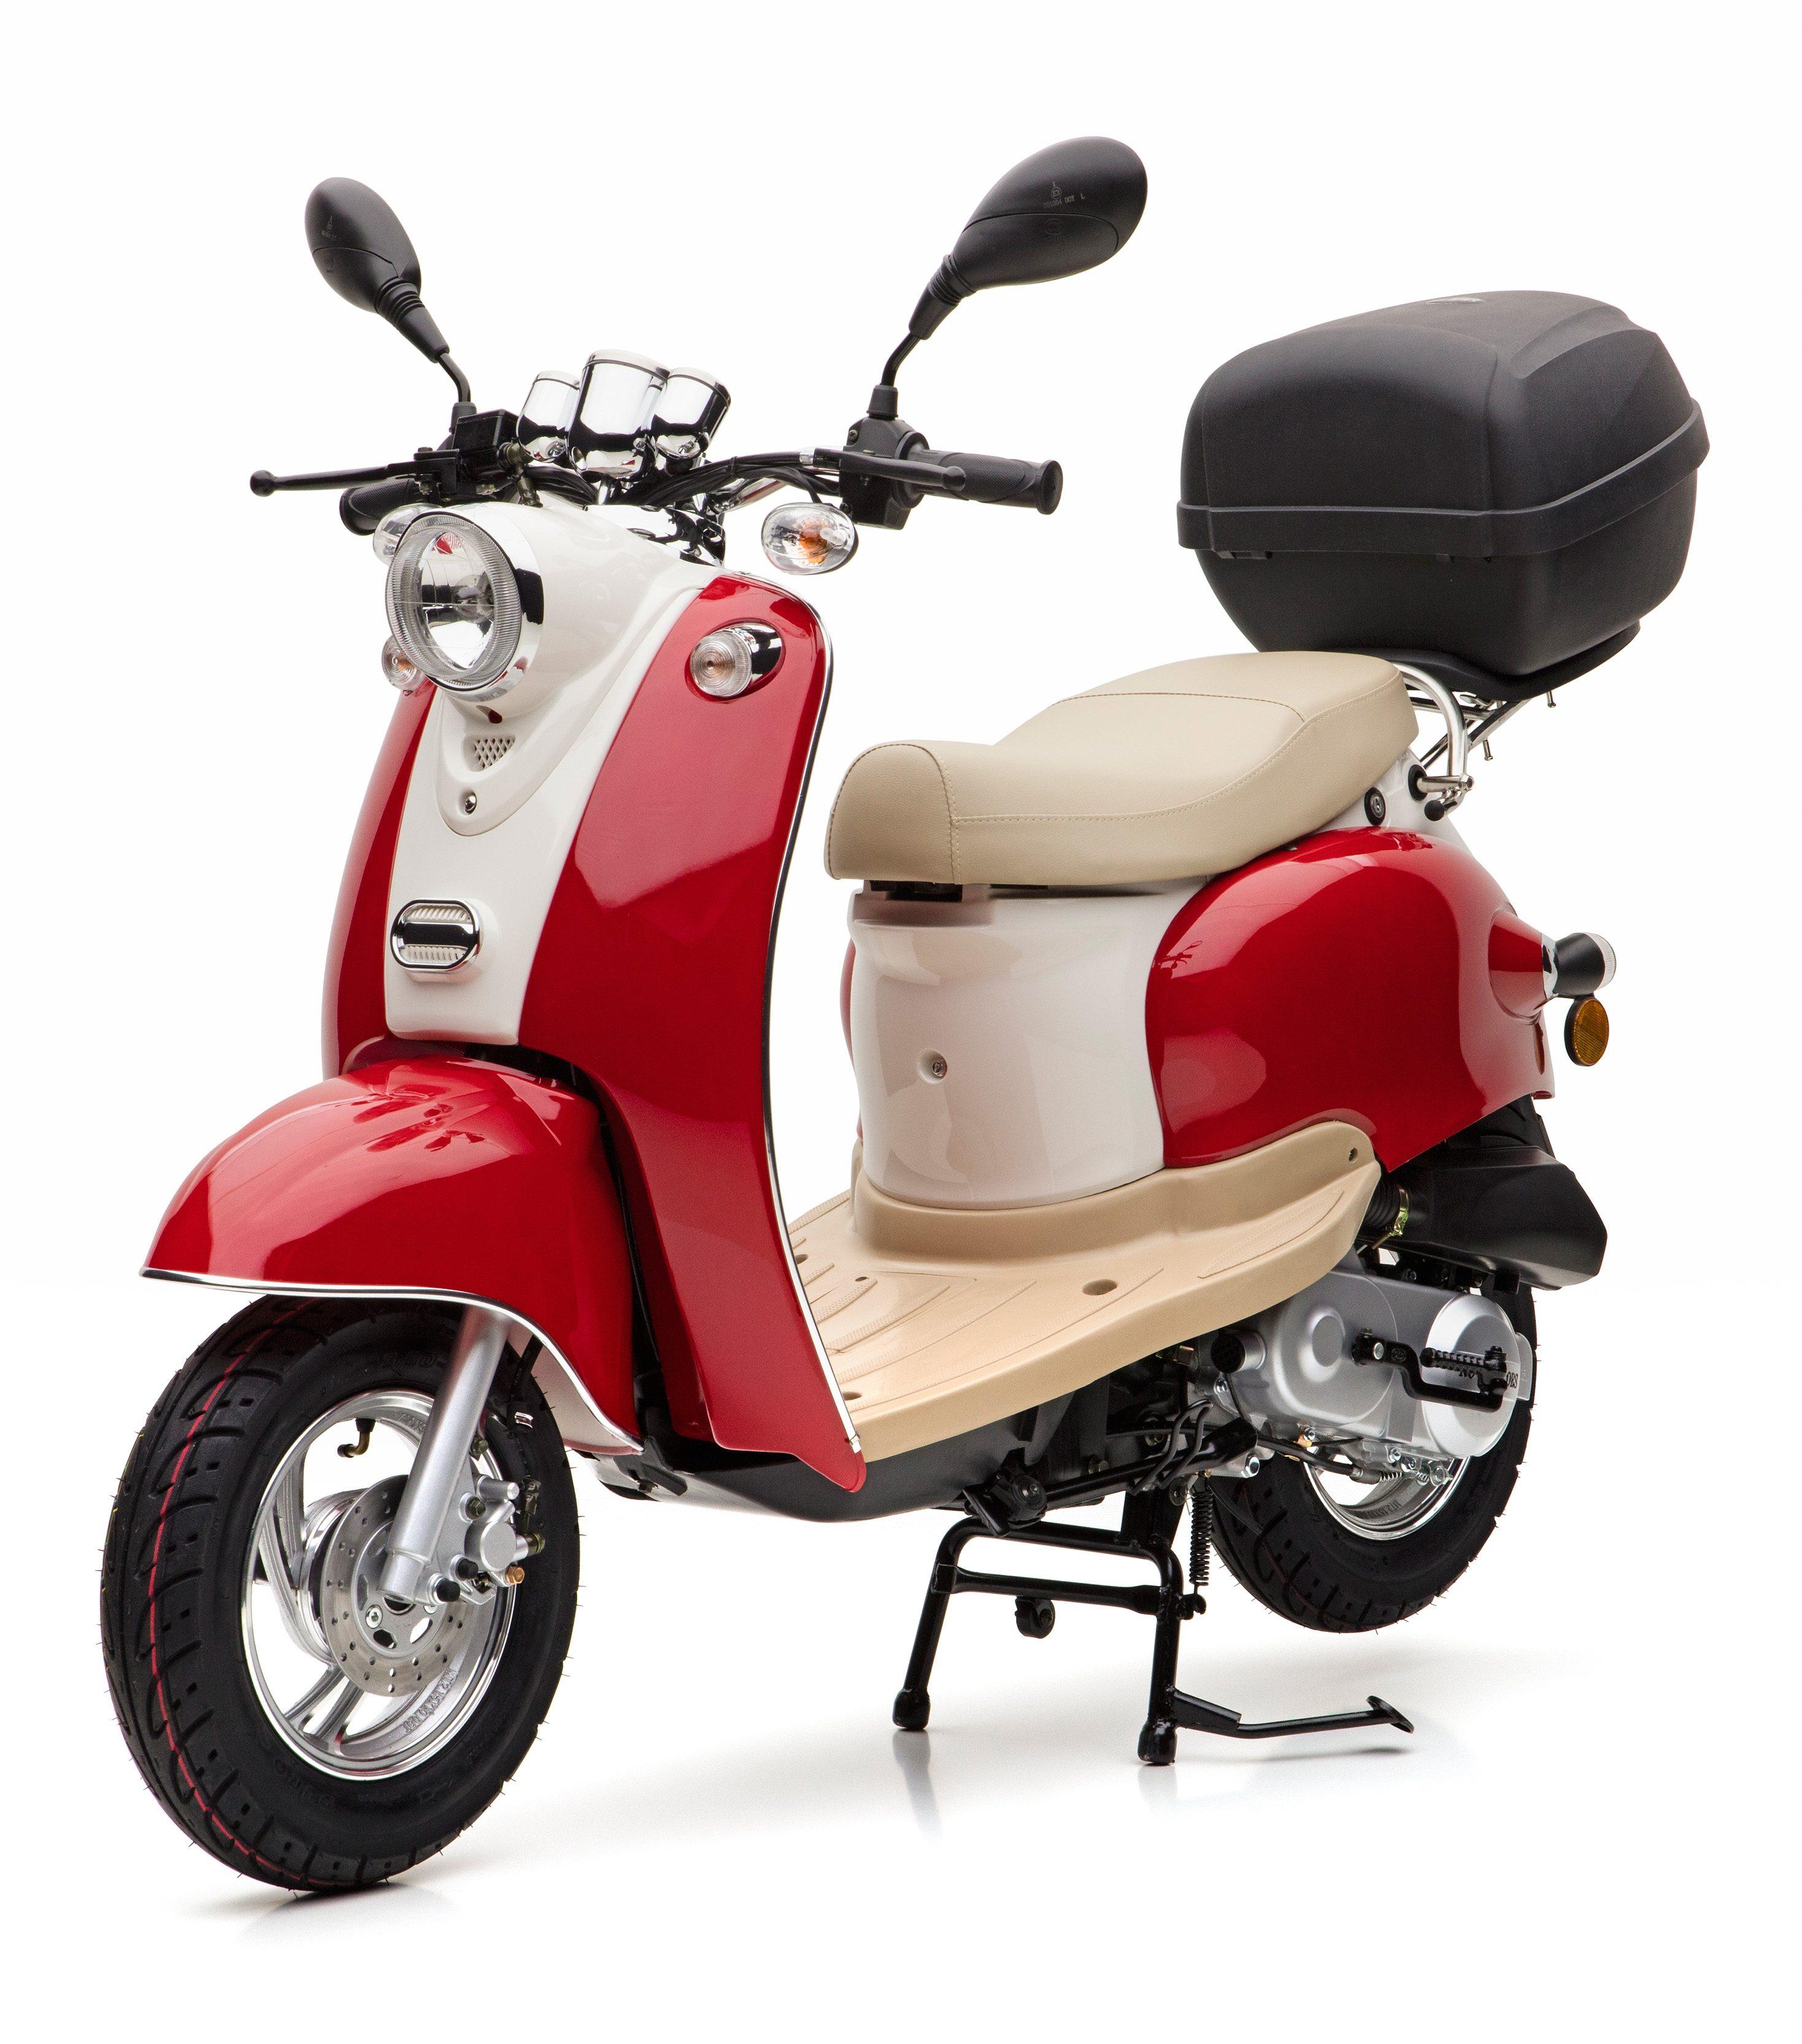 Nova Motors Mofaroller inkl. Topcase, 49 ccm, 25 km/h, rot weiß, »Venezia II«